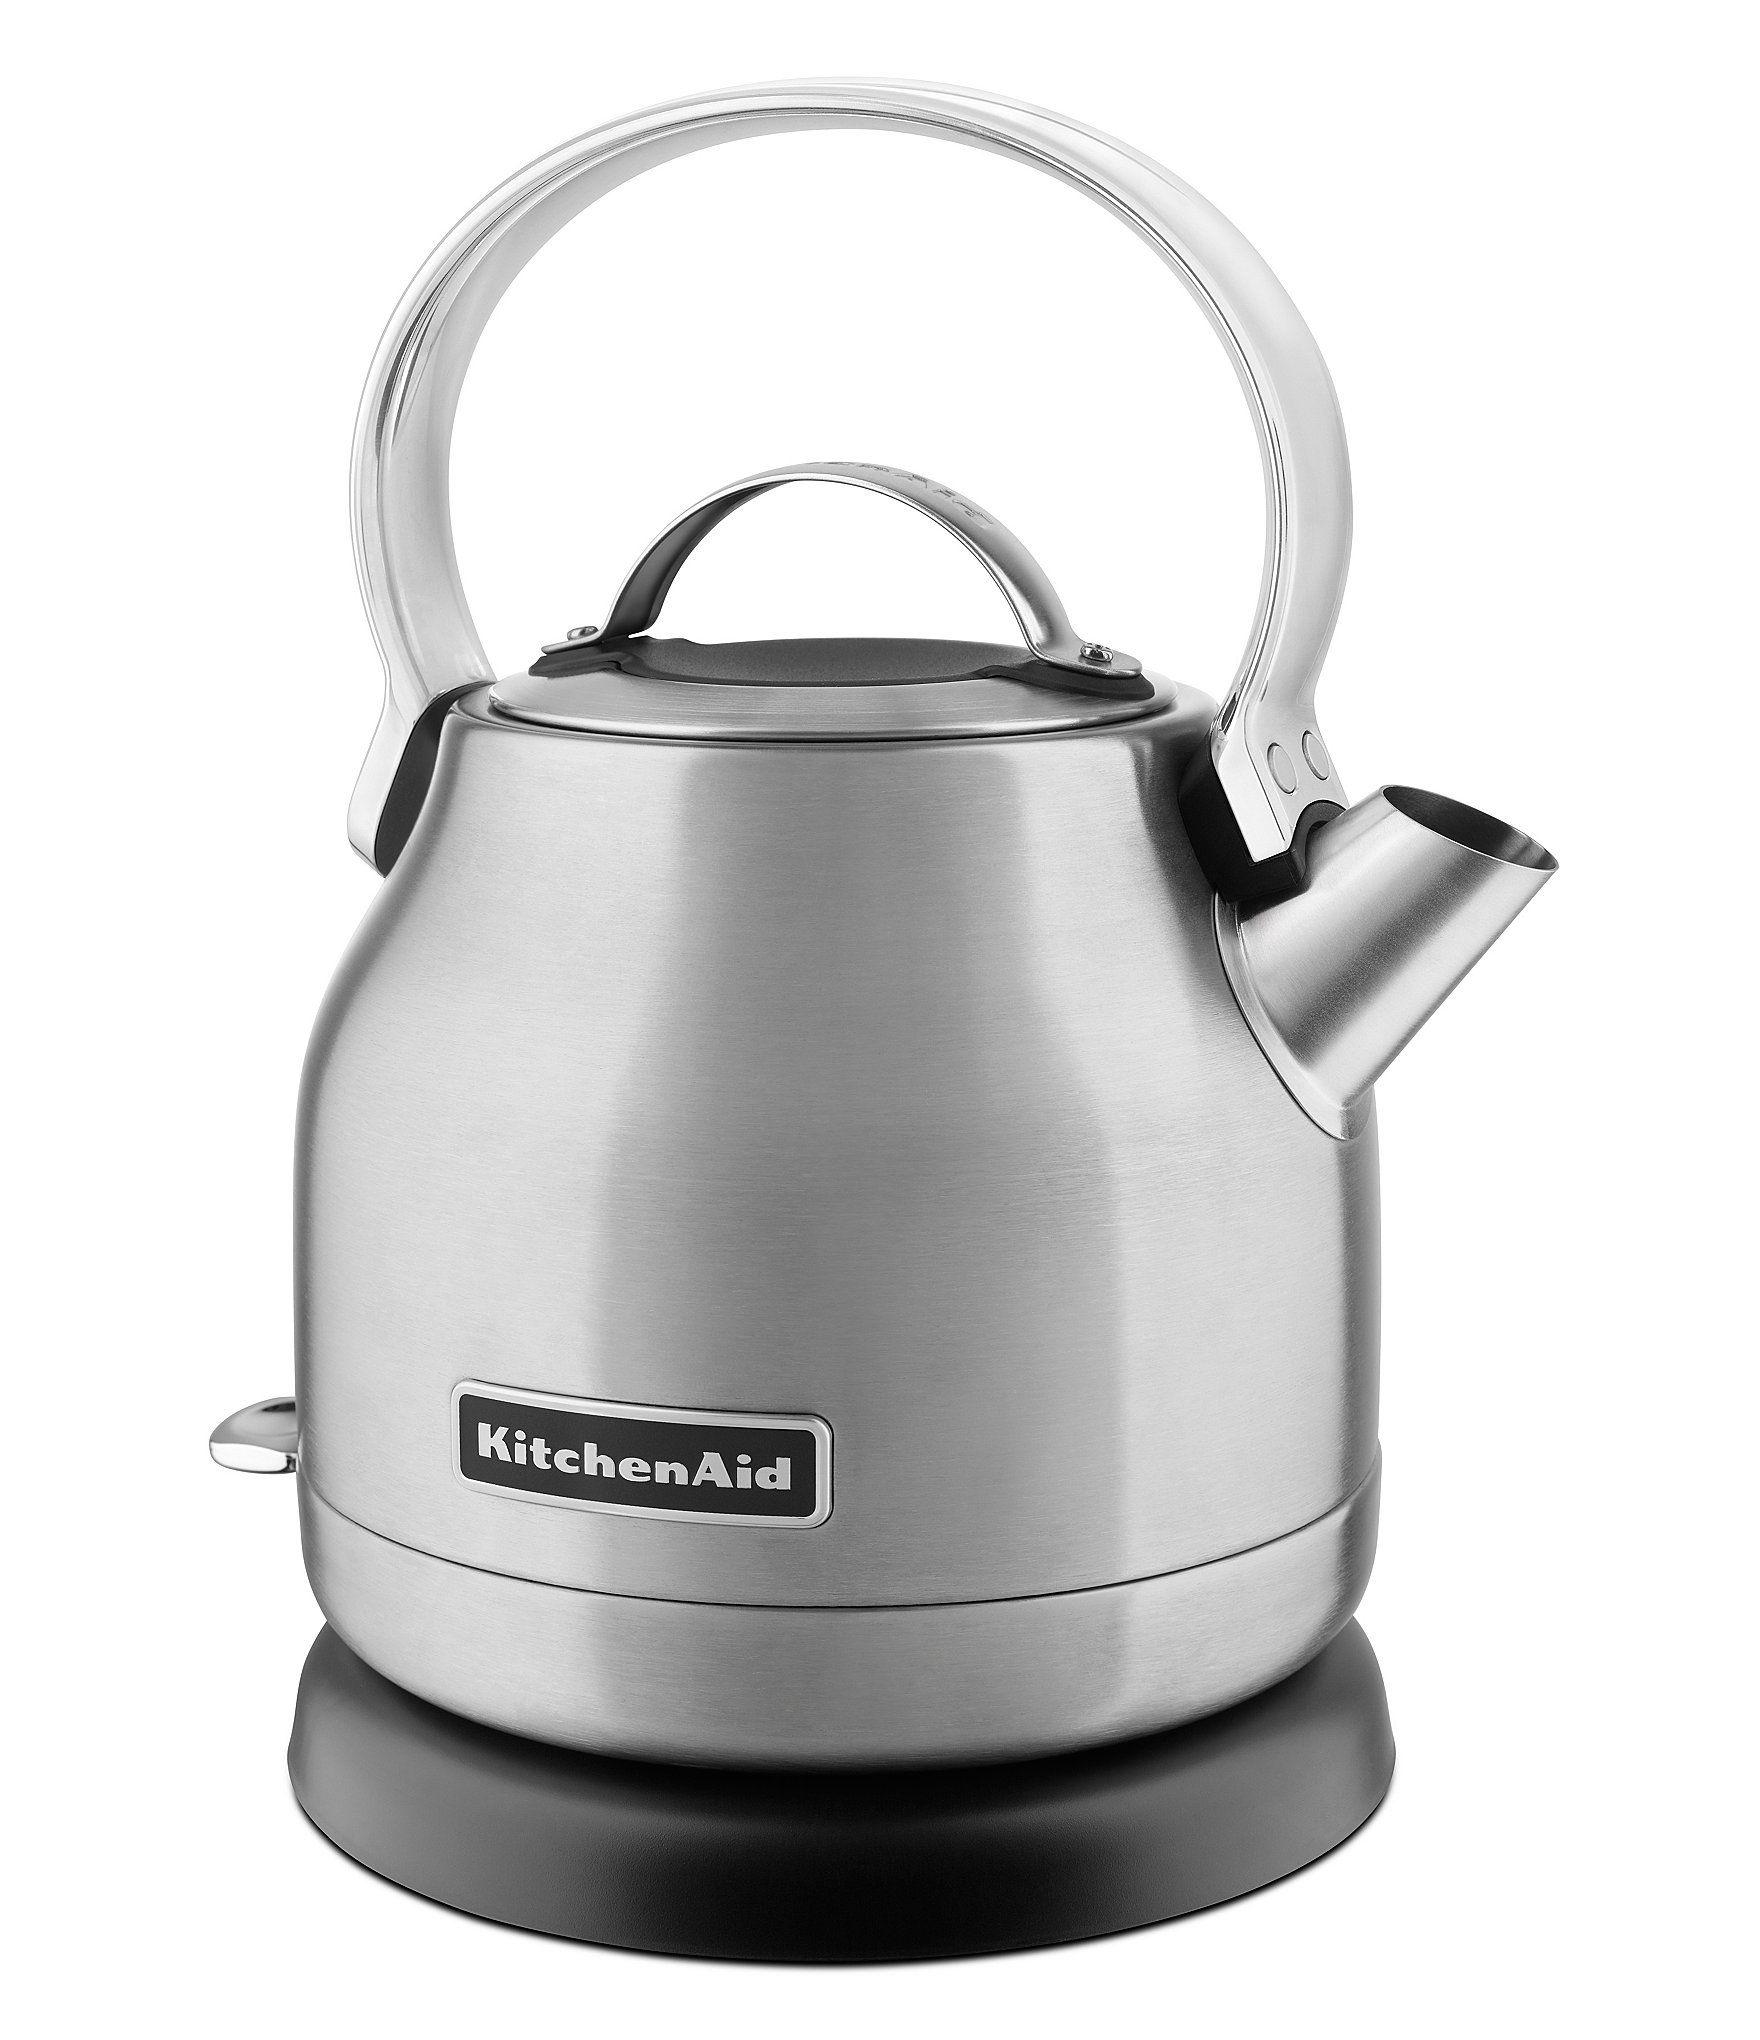 Kitchenaid electric kettle dillards electric tea